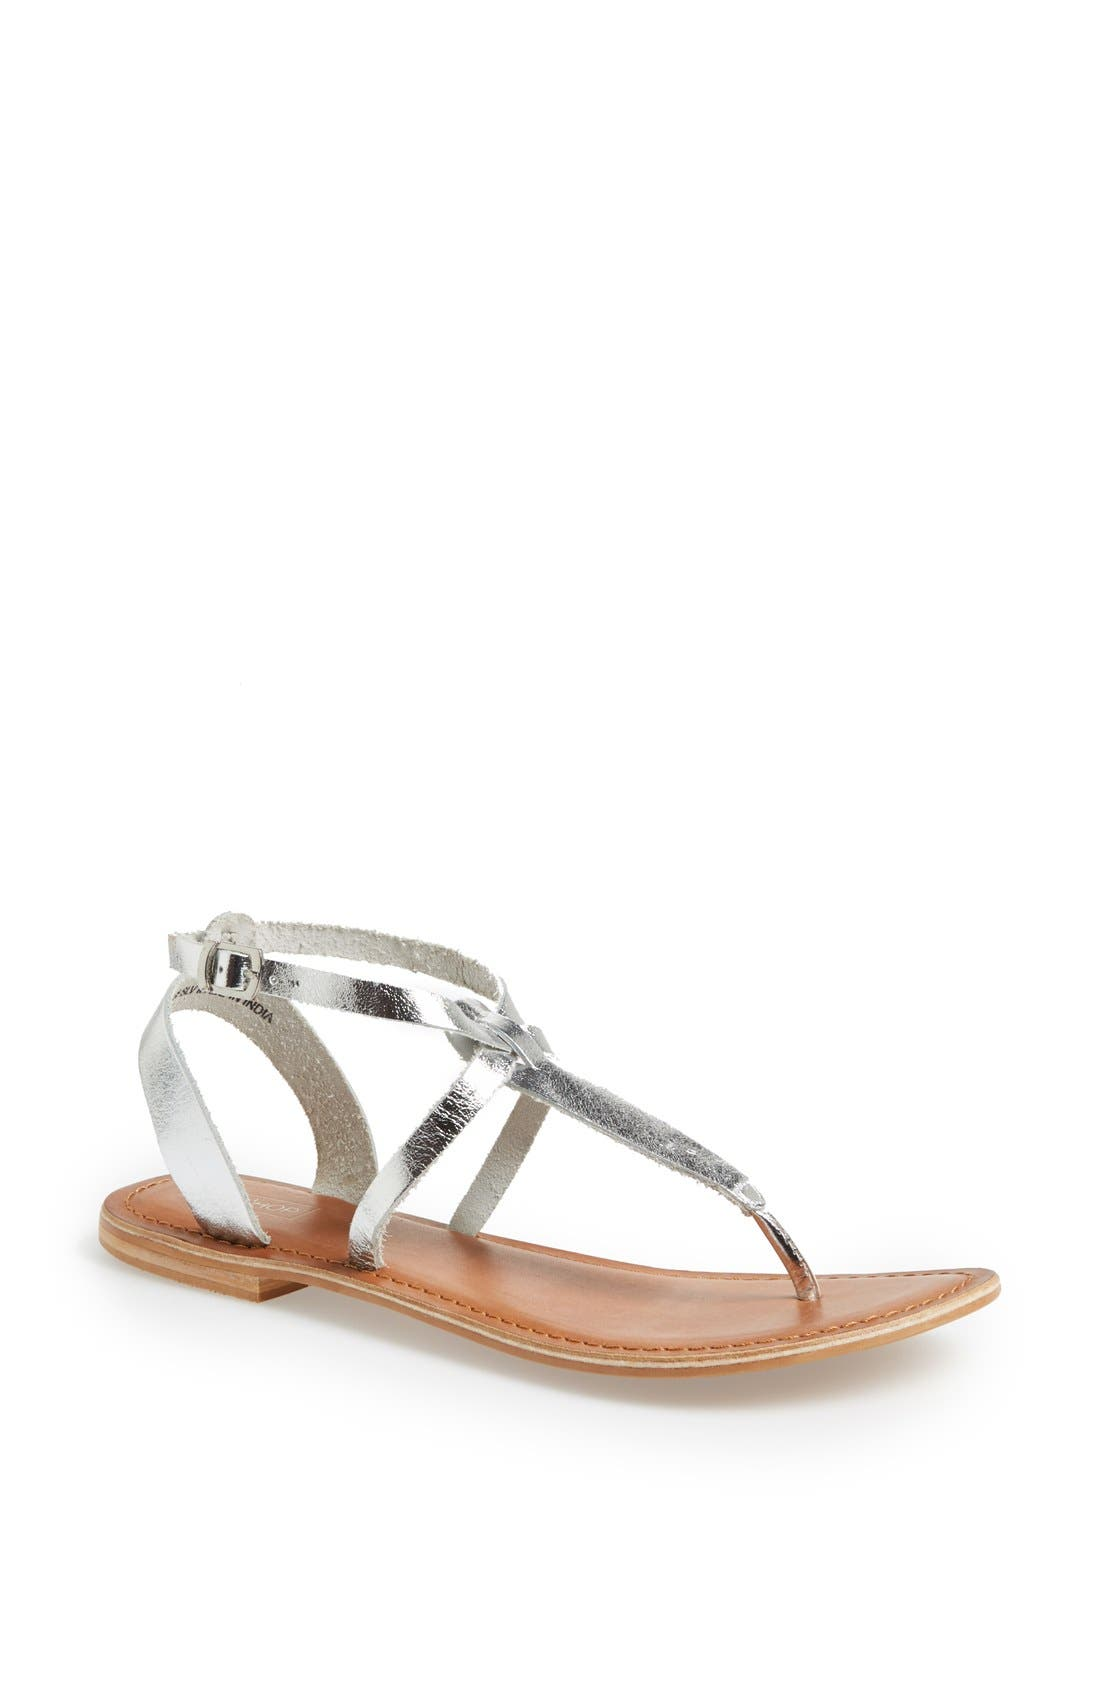 Main Image - Topshop 'Horizon' Leather Sandal